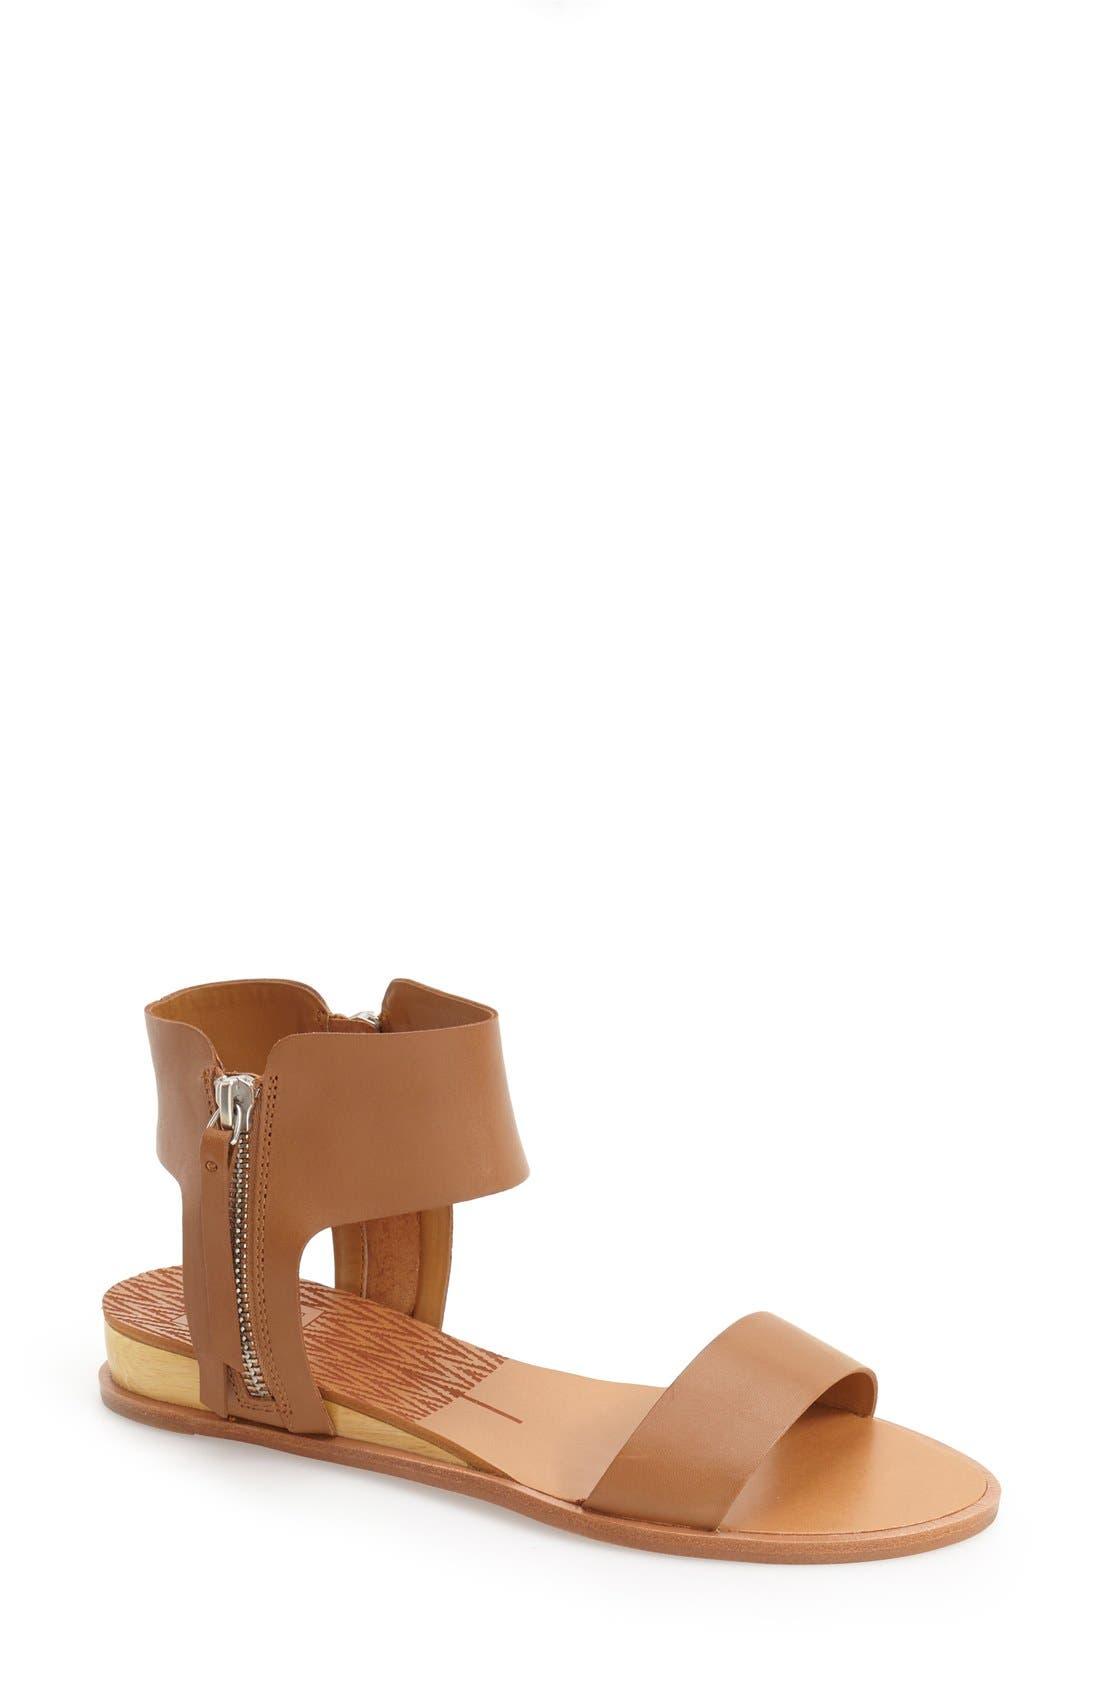 Main Image - Dolce Vita 'Paris' Ankle Cuff Sandal (Women)